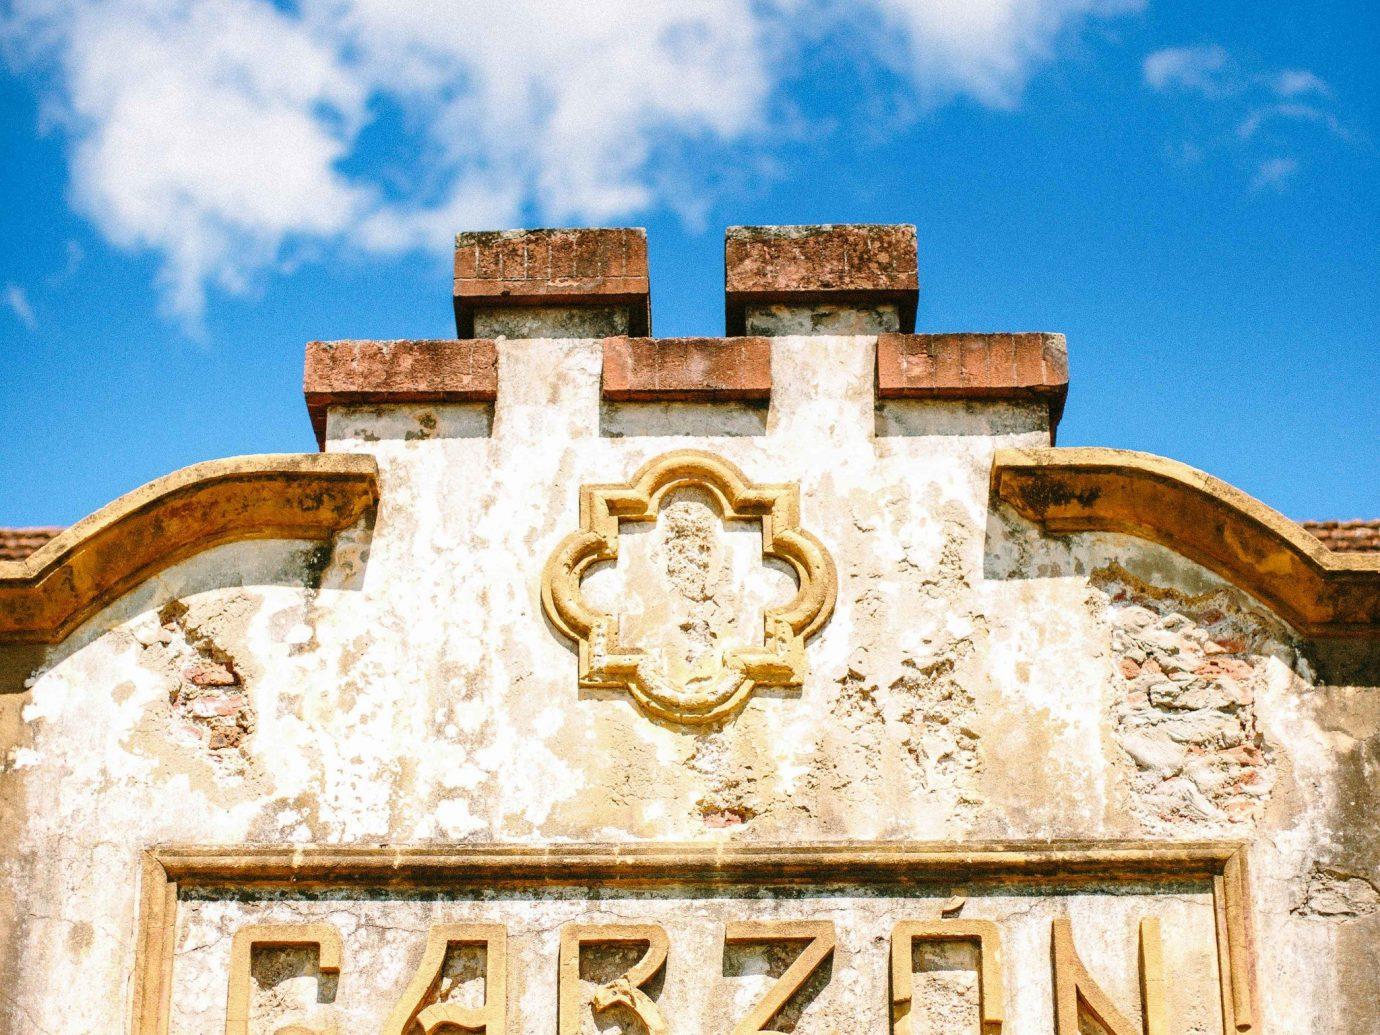 Beach Romantic Getaways south america Trip Ideas Uruguay sky landmark arch wall building cloud facade history historic site ancient history stock photography tourism